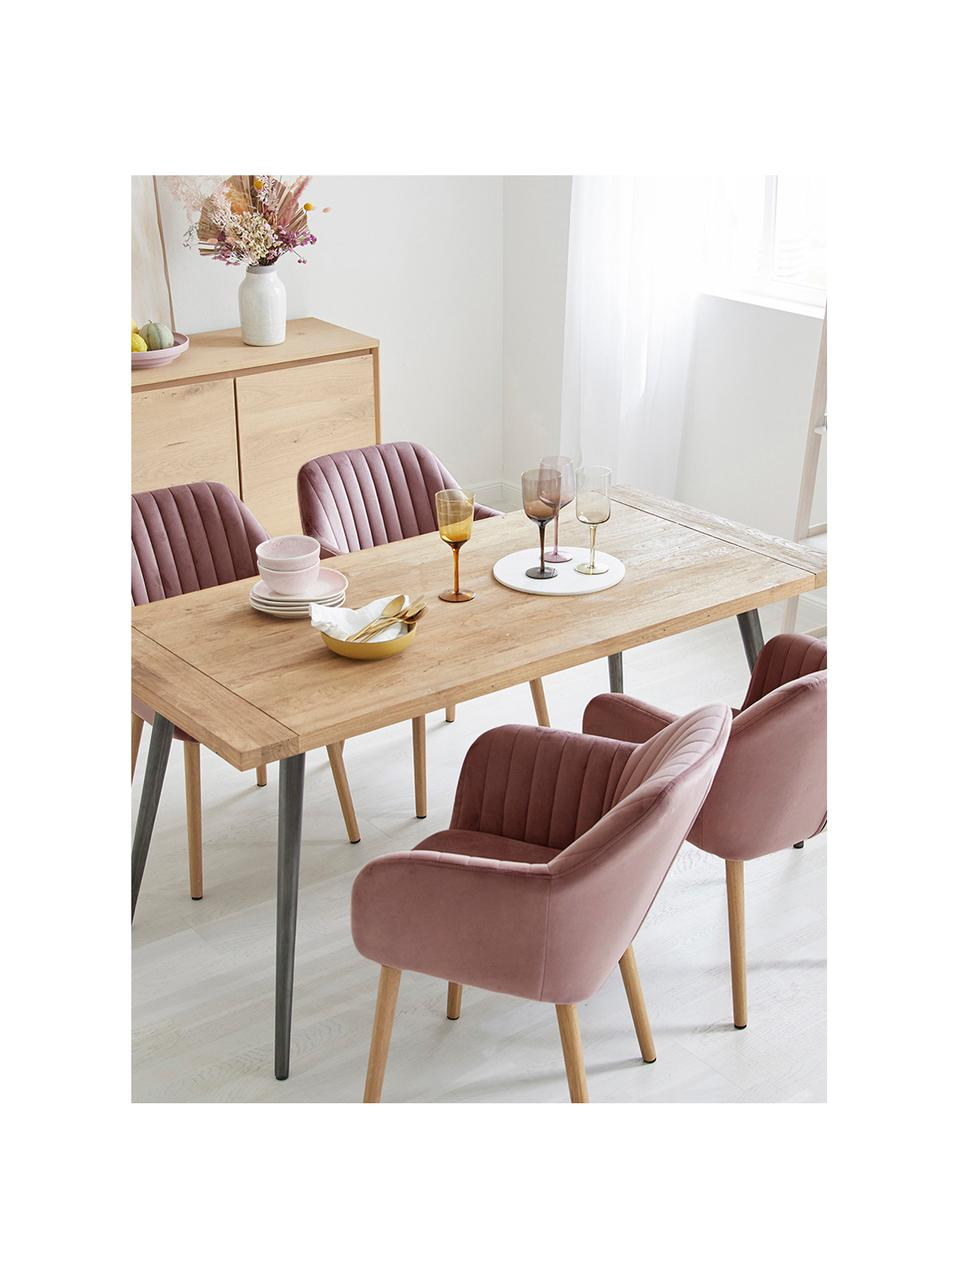 Fluwelen armstoel Emilia met houten poten, Bekleding: polyester fluweel, Poten: eikenhout, geolied, Fluweel roze, poten eiken, B 57 x D 59 cm